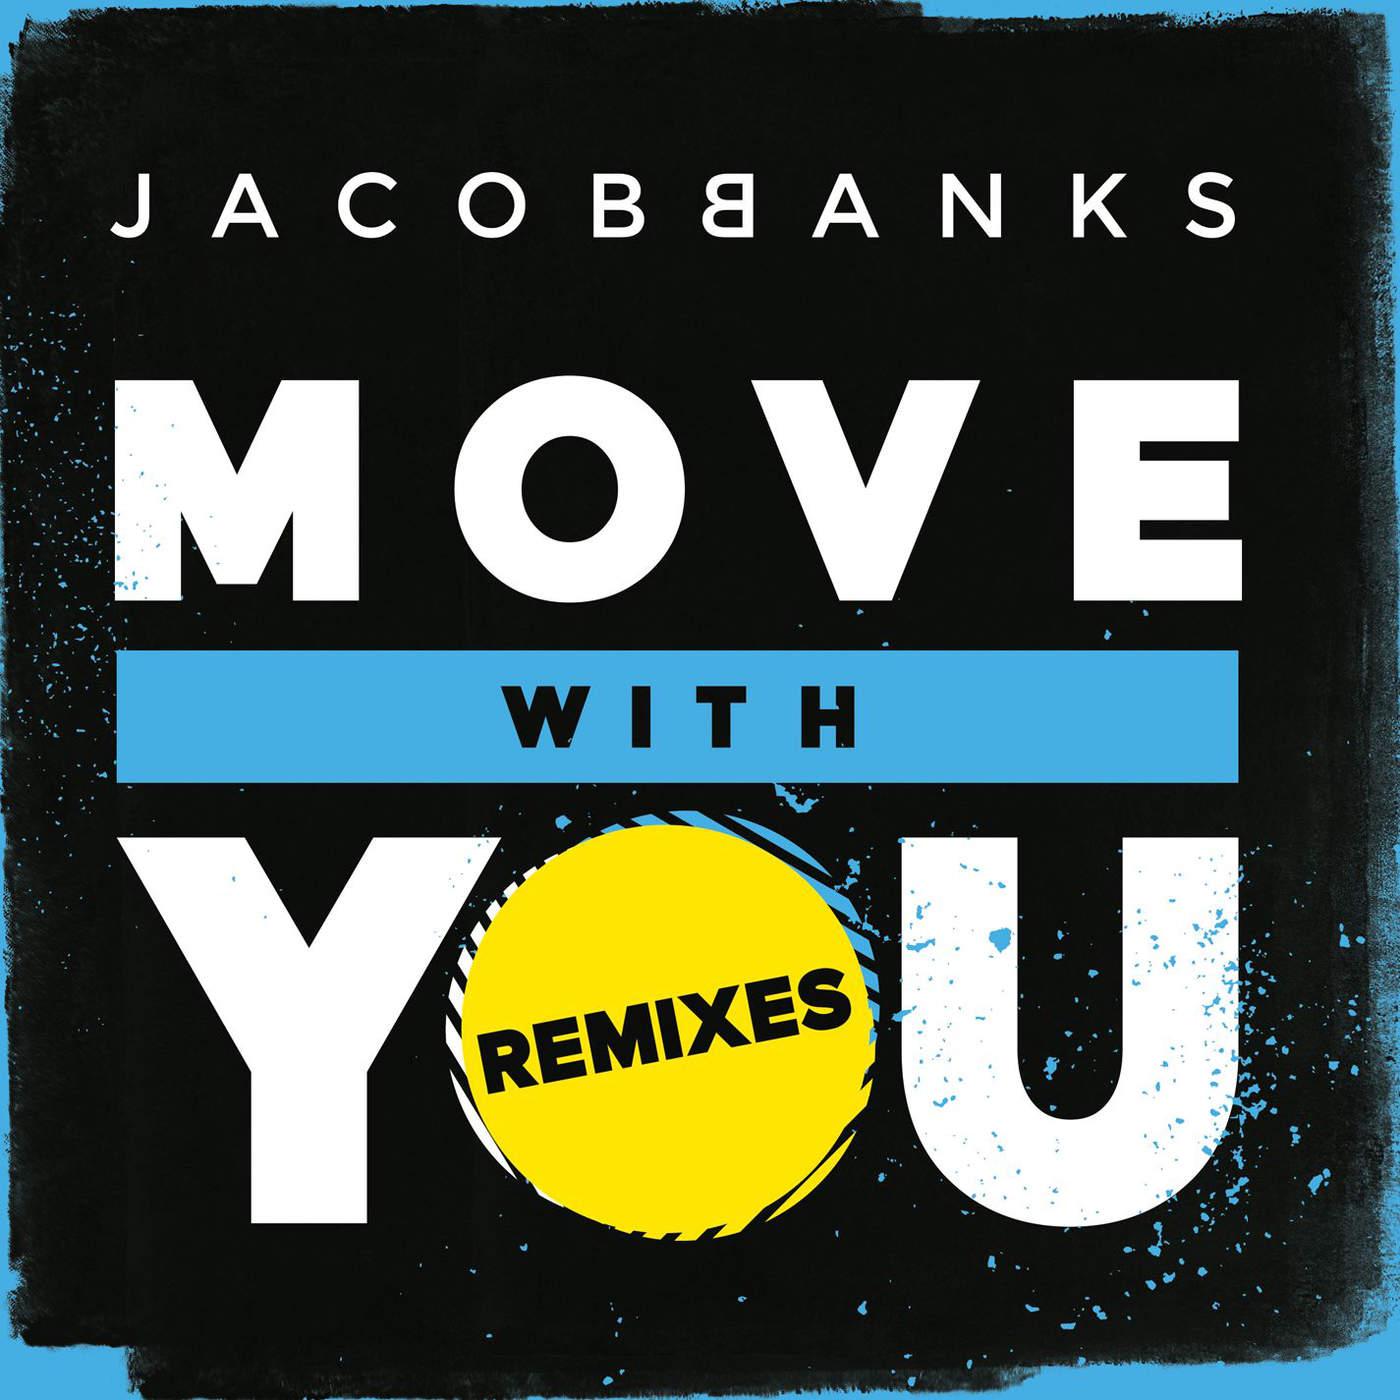 Jacob Banks - Move With You (Remixes) - EP Cover